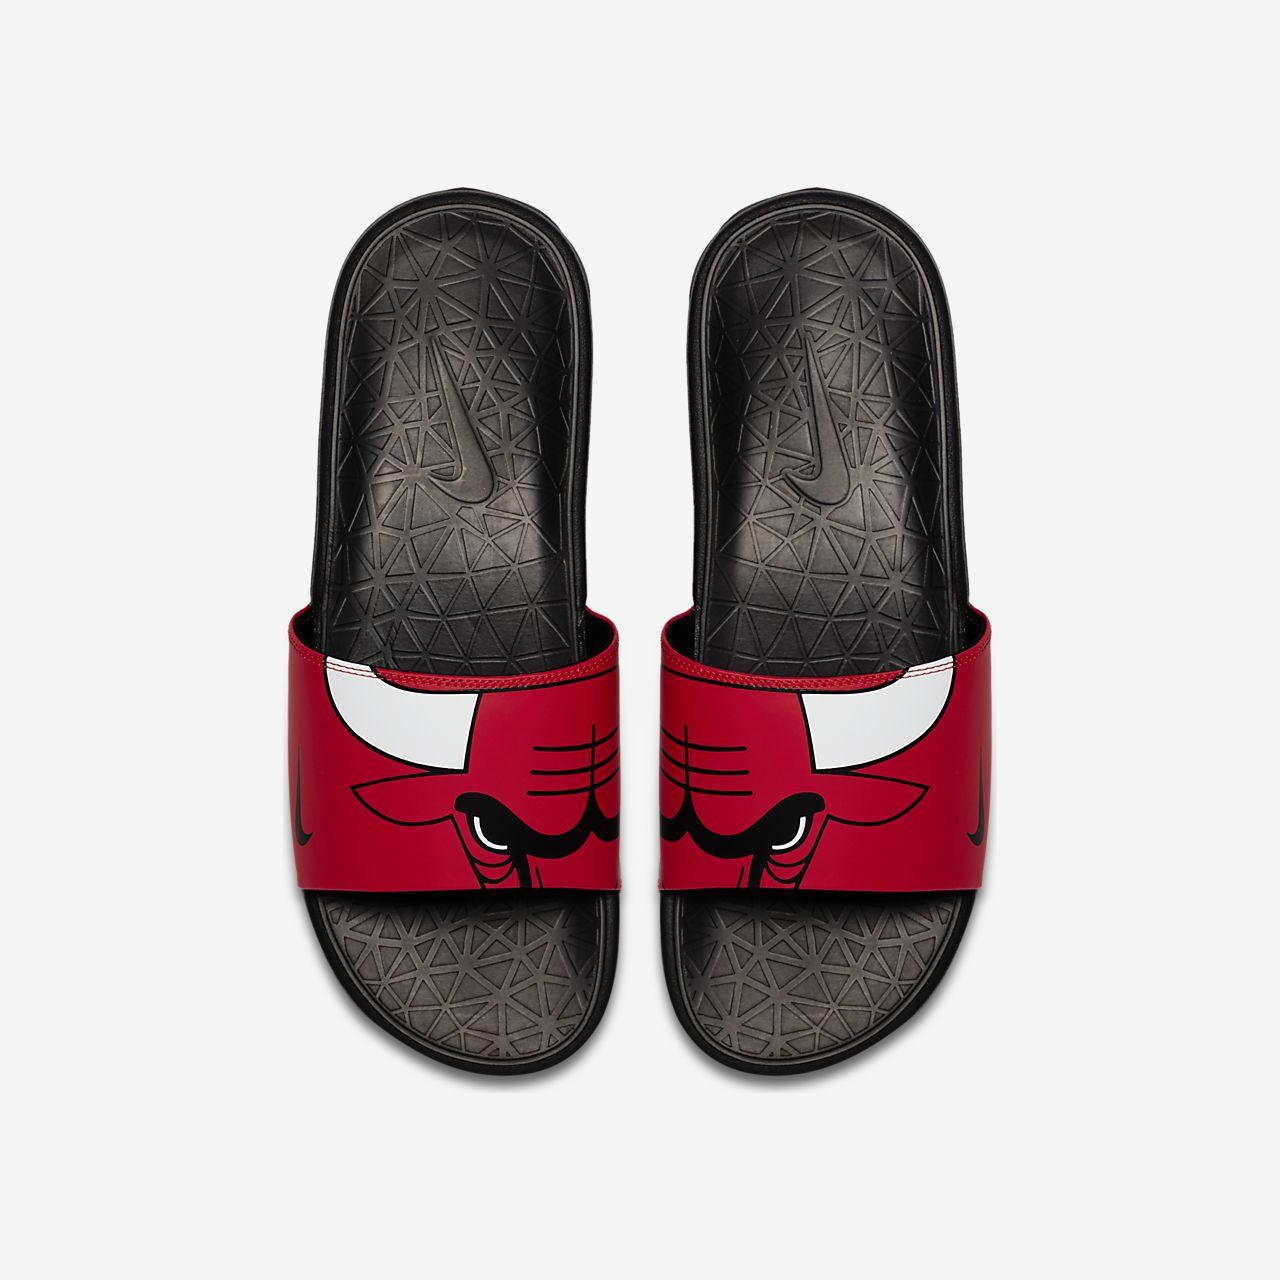 Hombre Sandalias Nike Chile Chile Sandalias Hombre Hombre Nike Chile Sandalias Sandalias Nike OX8wn0Pk